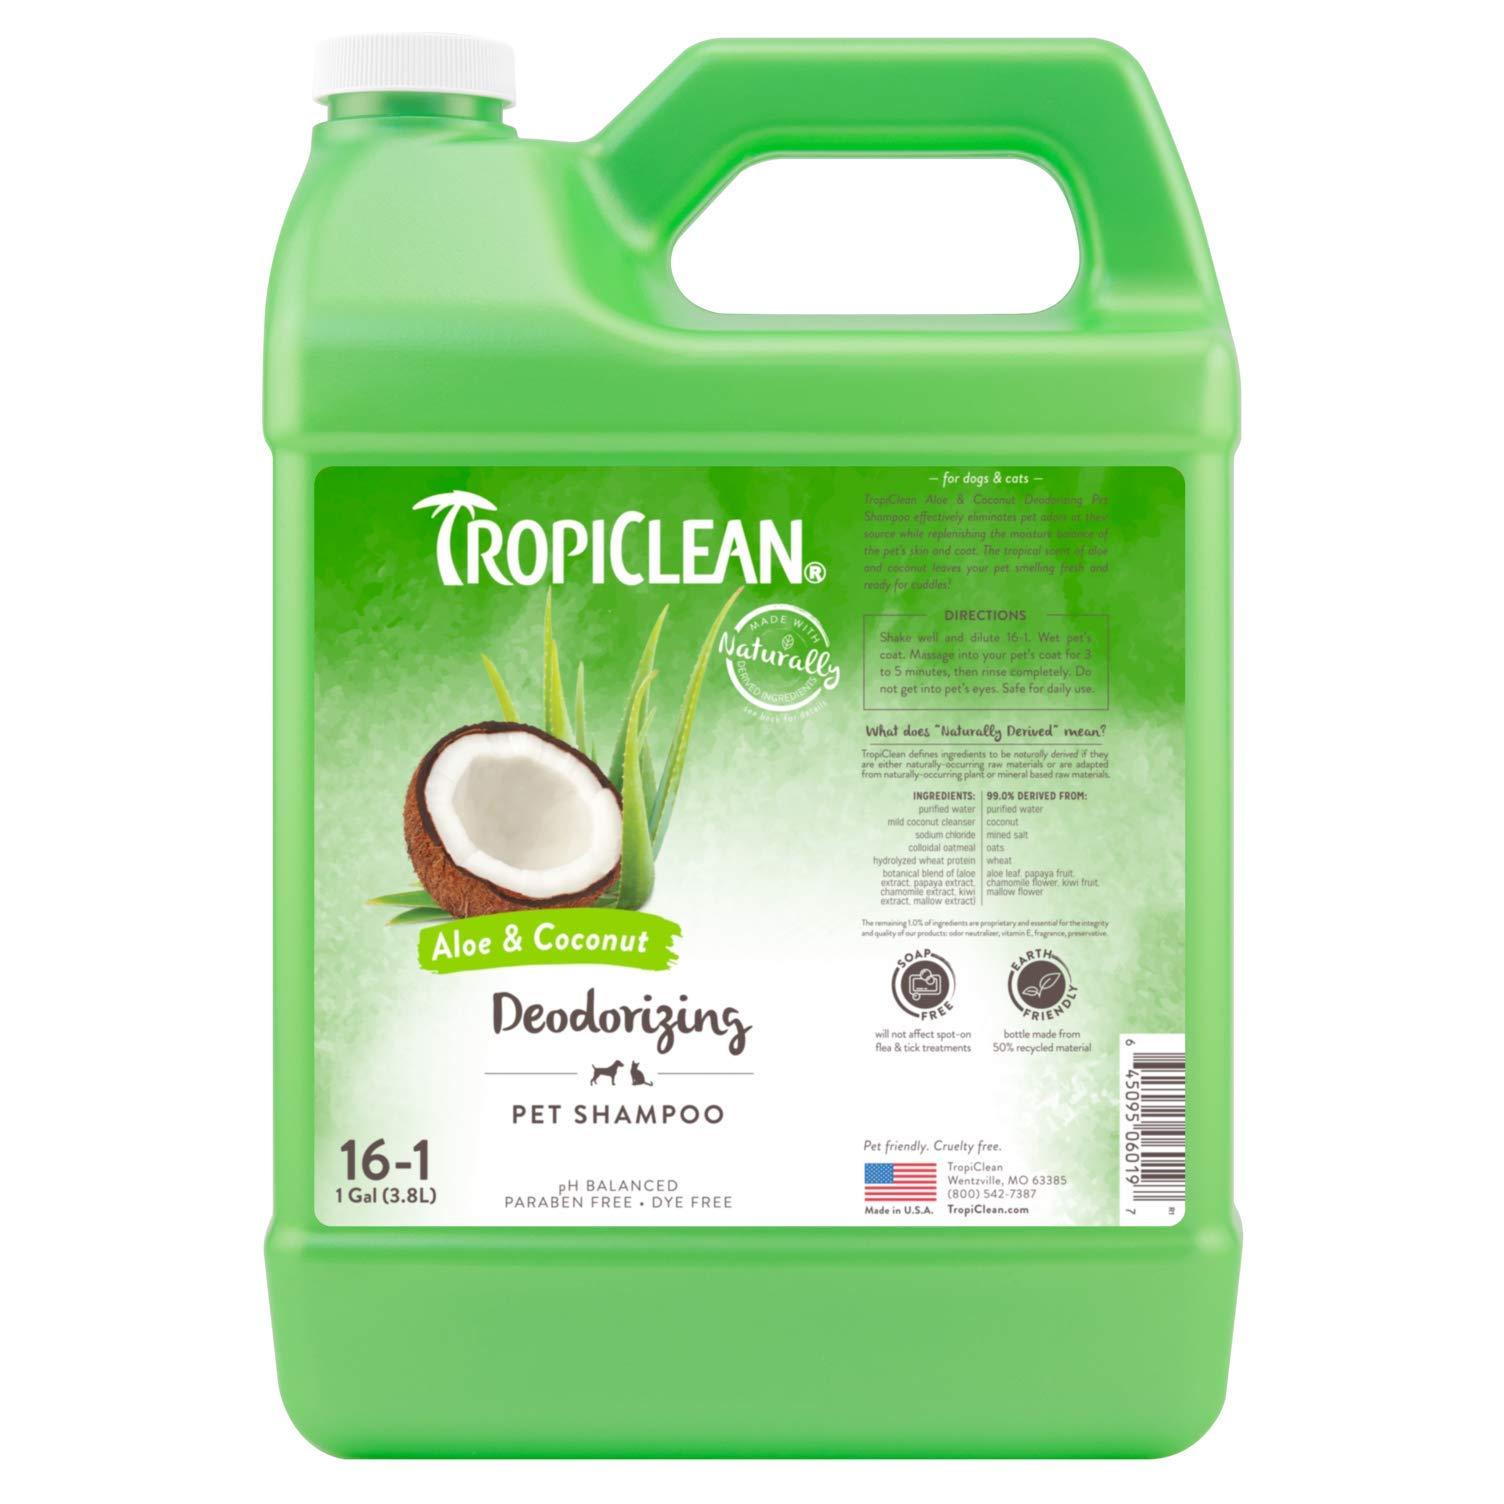 Tropiclean Deodorizing Aloe and Coconut Pet Shampoo, 1 Gall